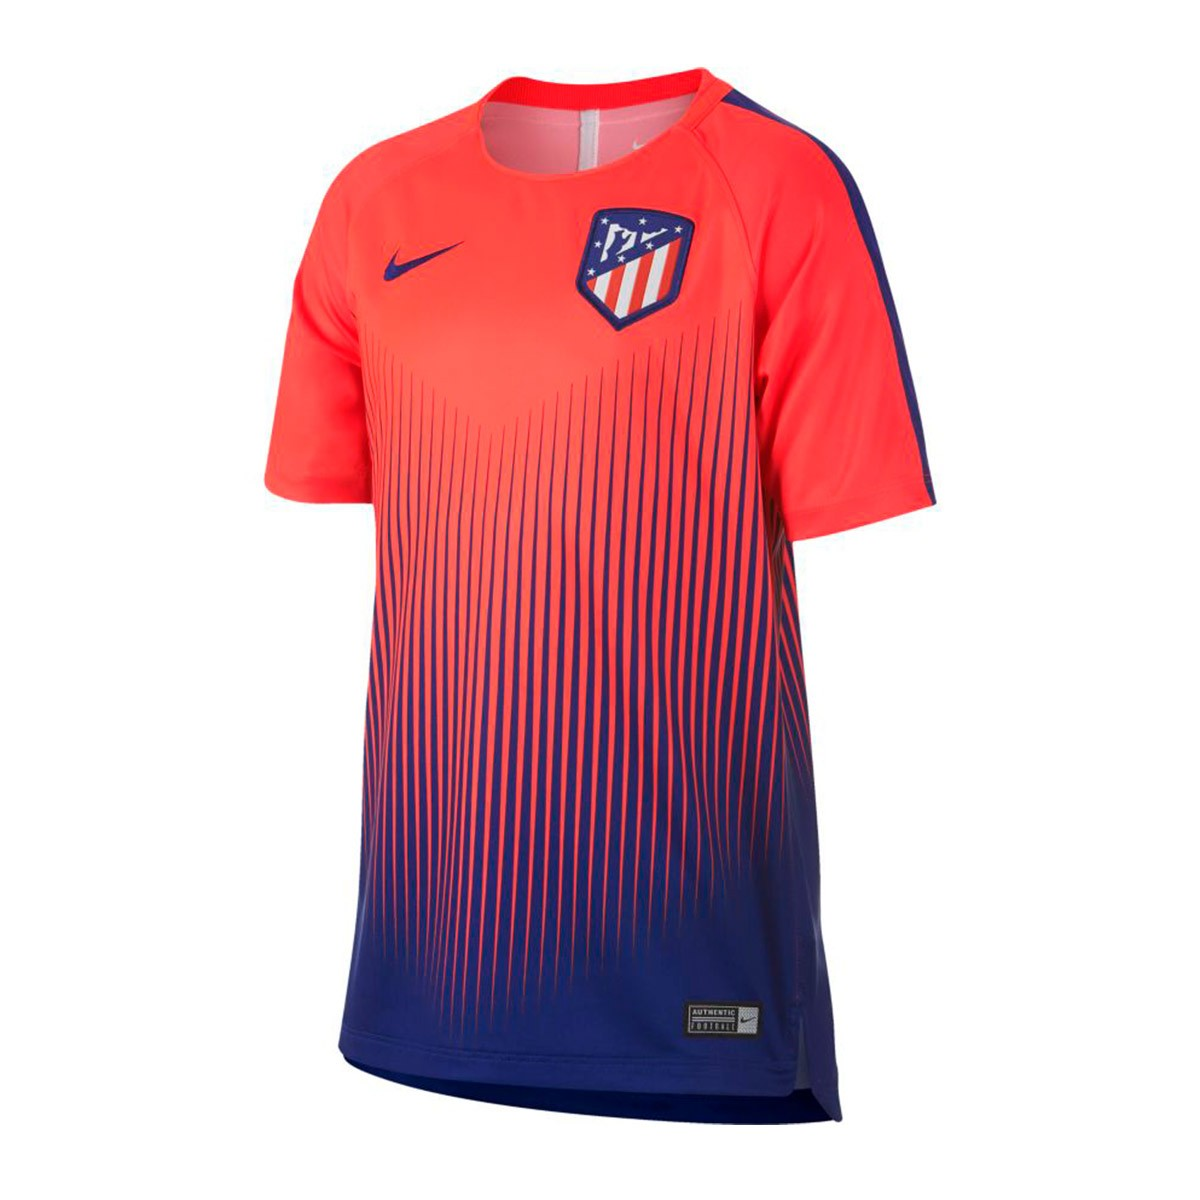 190e2471b Jersey Nike Kids Atlético de Madrid Squad SS GX 2018-2019 Bright  crimson-Deep royal blue - Tienda de fútbol Fútbol Emotion